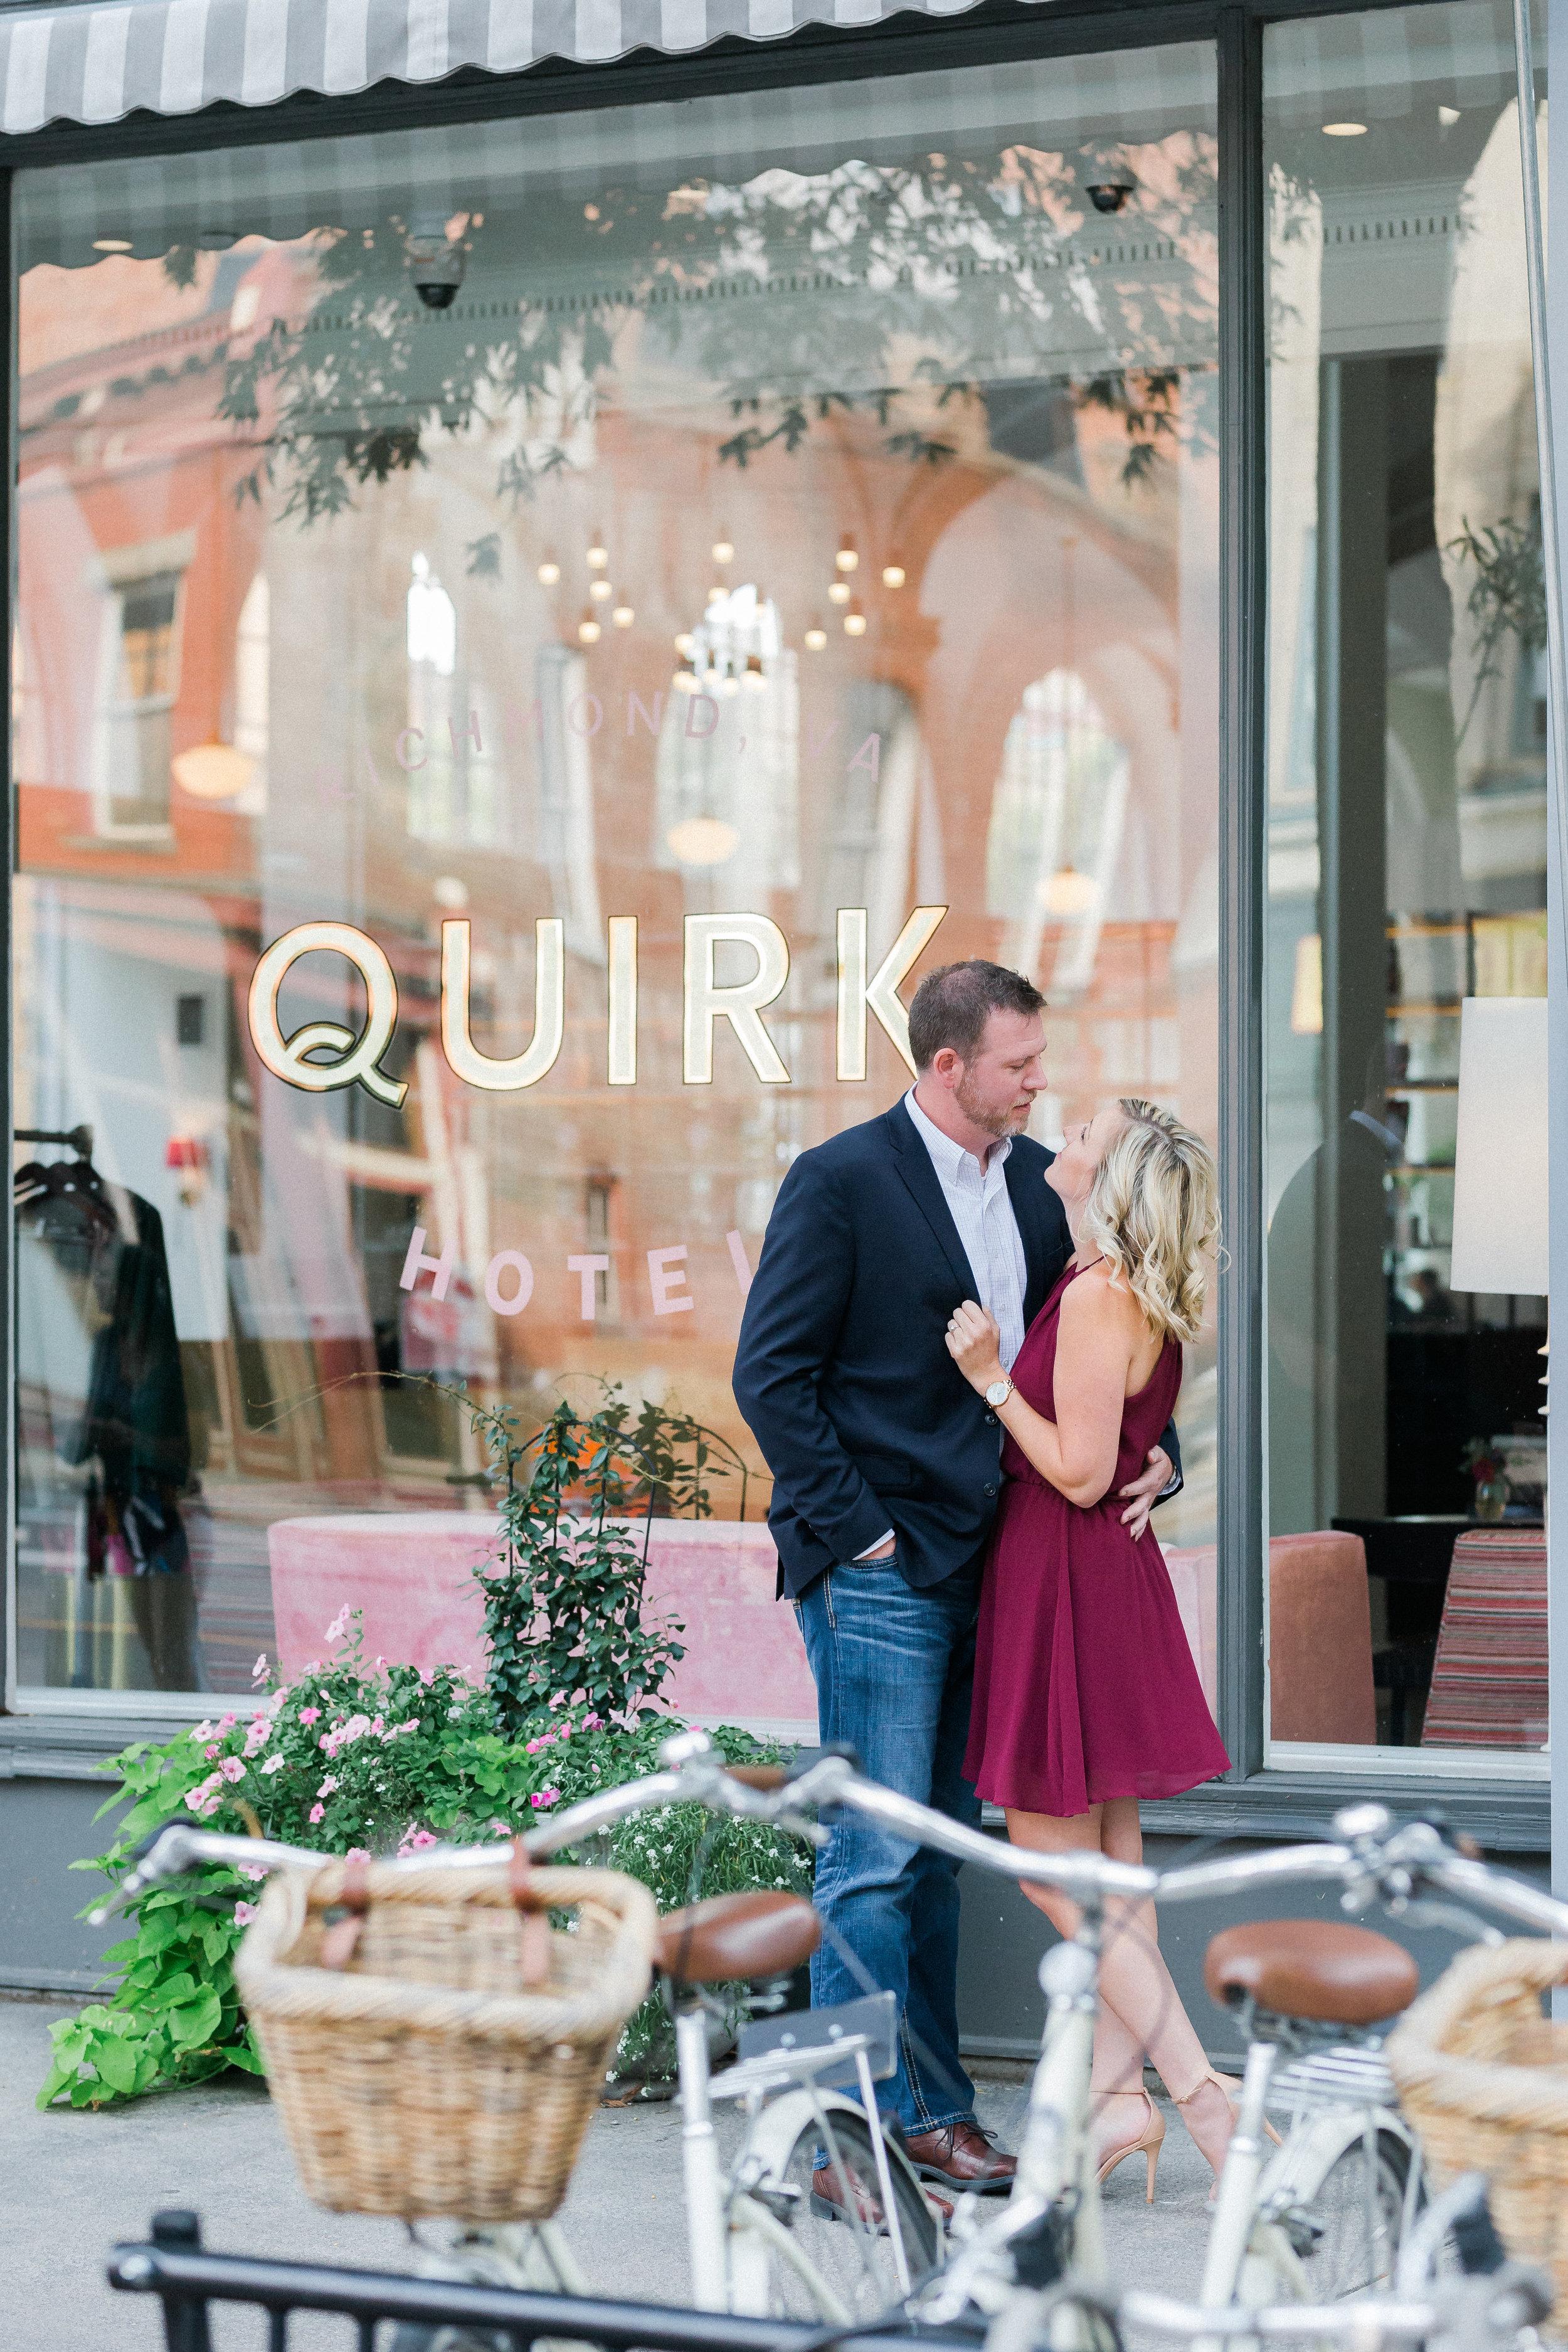 Quirk Hotel + Belle Island Engagement Photos - Luke and Ashley Photography - Richmond Virginia Wedding Photographer -- Wedding Blog - The Overwhelmed Bride